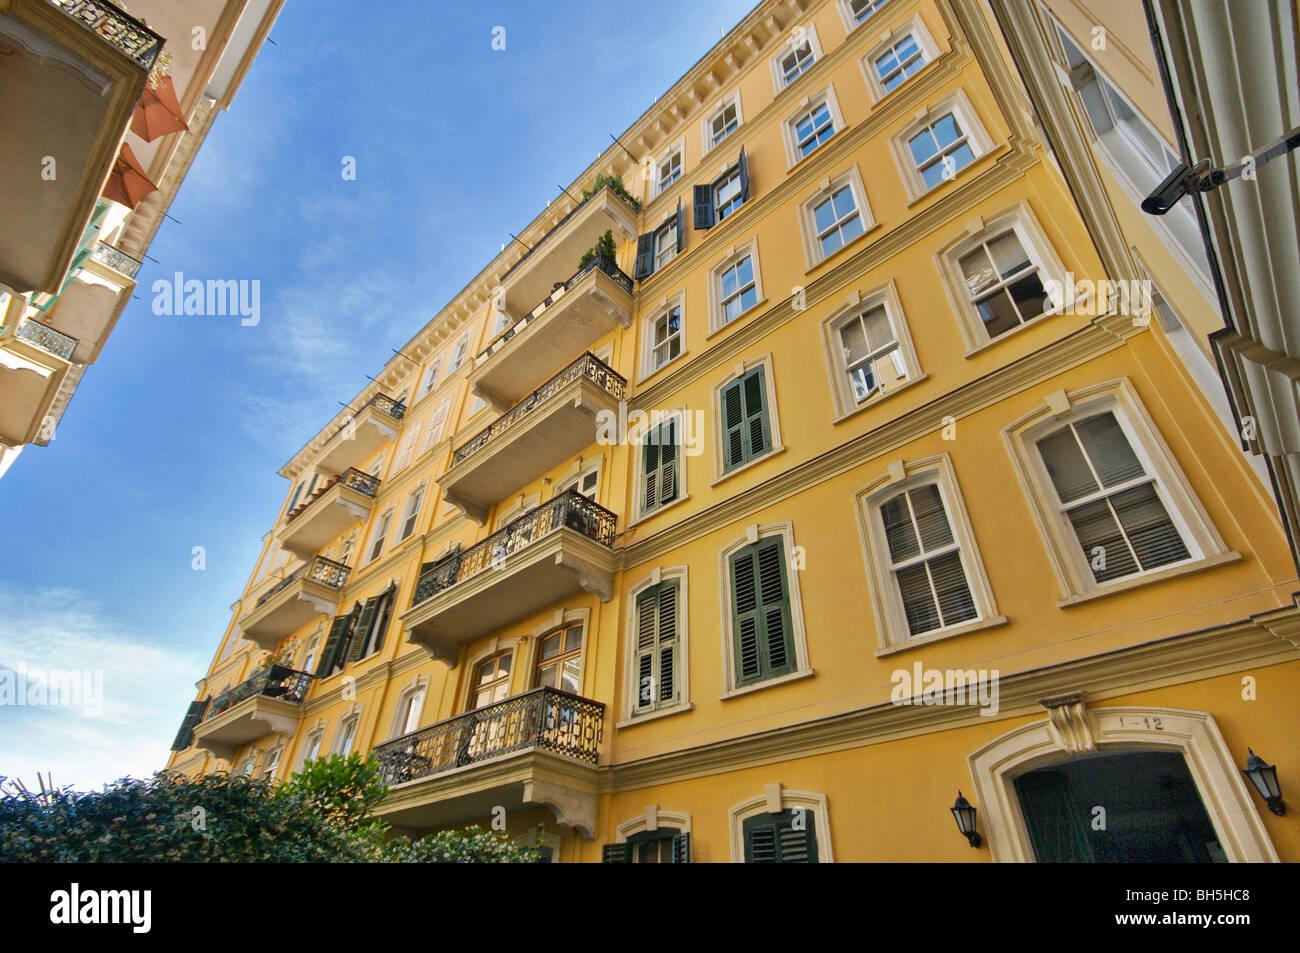 Dogan histórico edificio de apartamentos en Galata Estambul Turquia Imagen De Stock